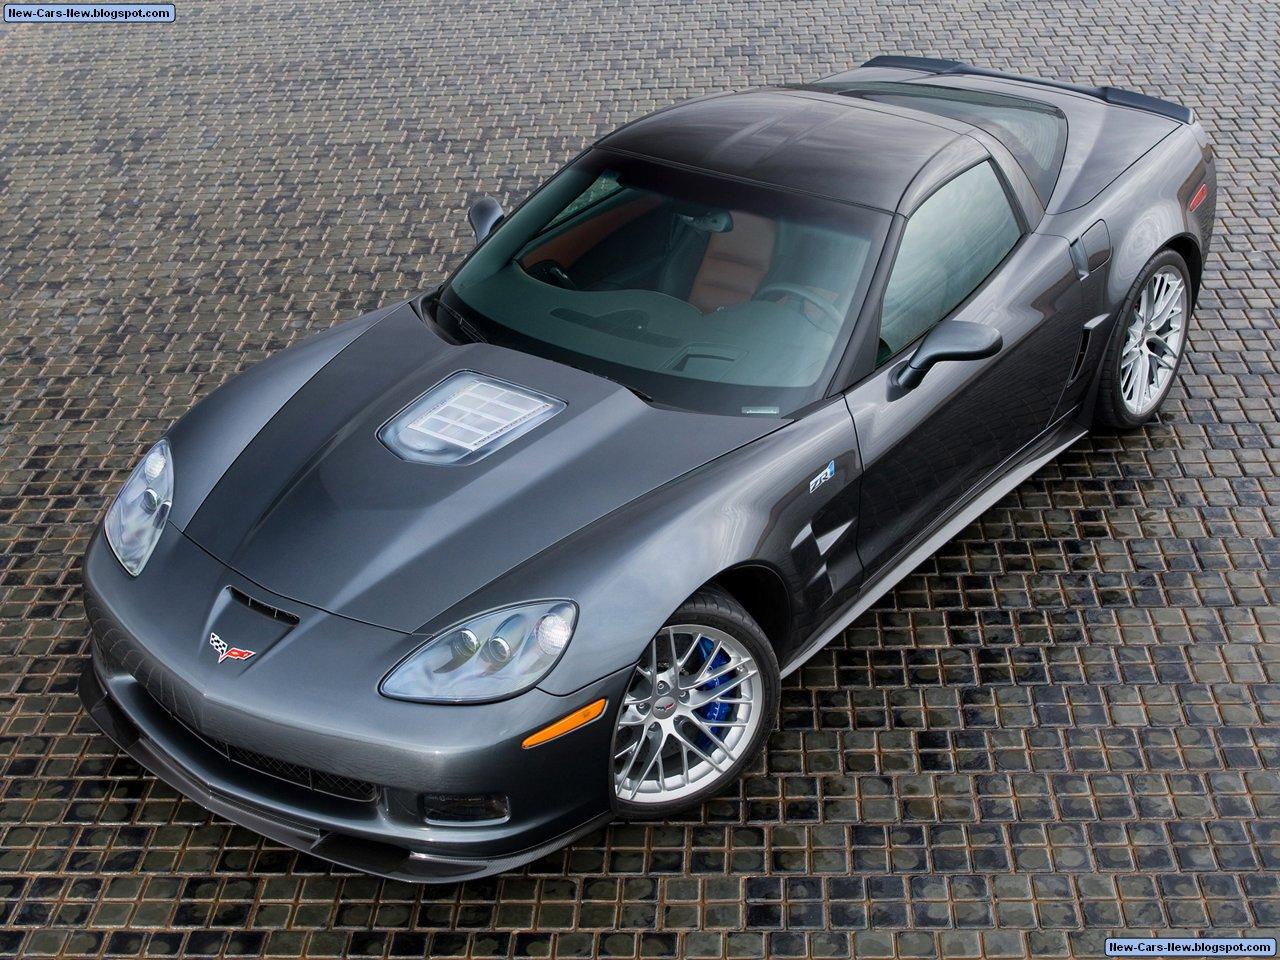 http://4.bp.blogspot.com/_U4w592tUDHM/TDybCtKfw4I/AAAAAAAAEPc/jK7kRPjV4SI/s1600/Chevrolet-Corvette_ZR1_2009_1280x960_wallpaper_01.jpg